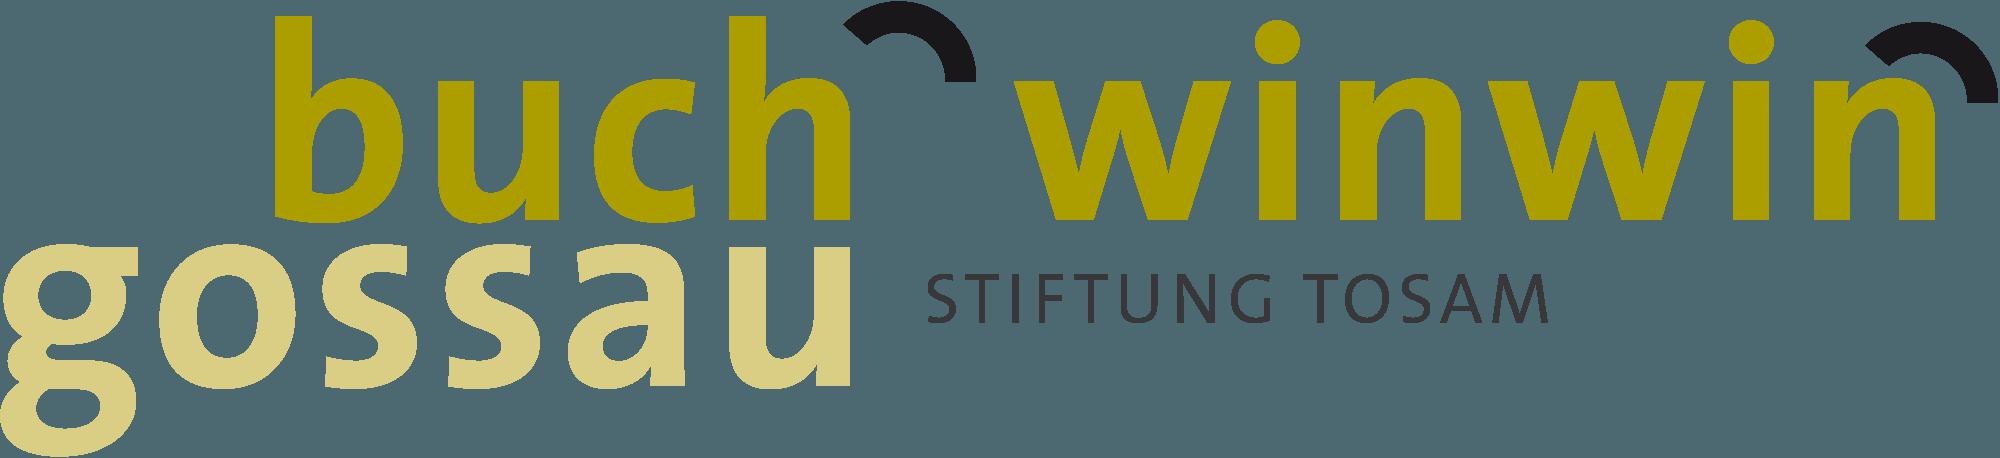 BuchWinWin Gossau Stiftung Tosam